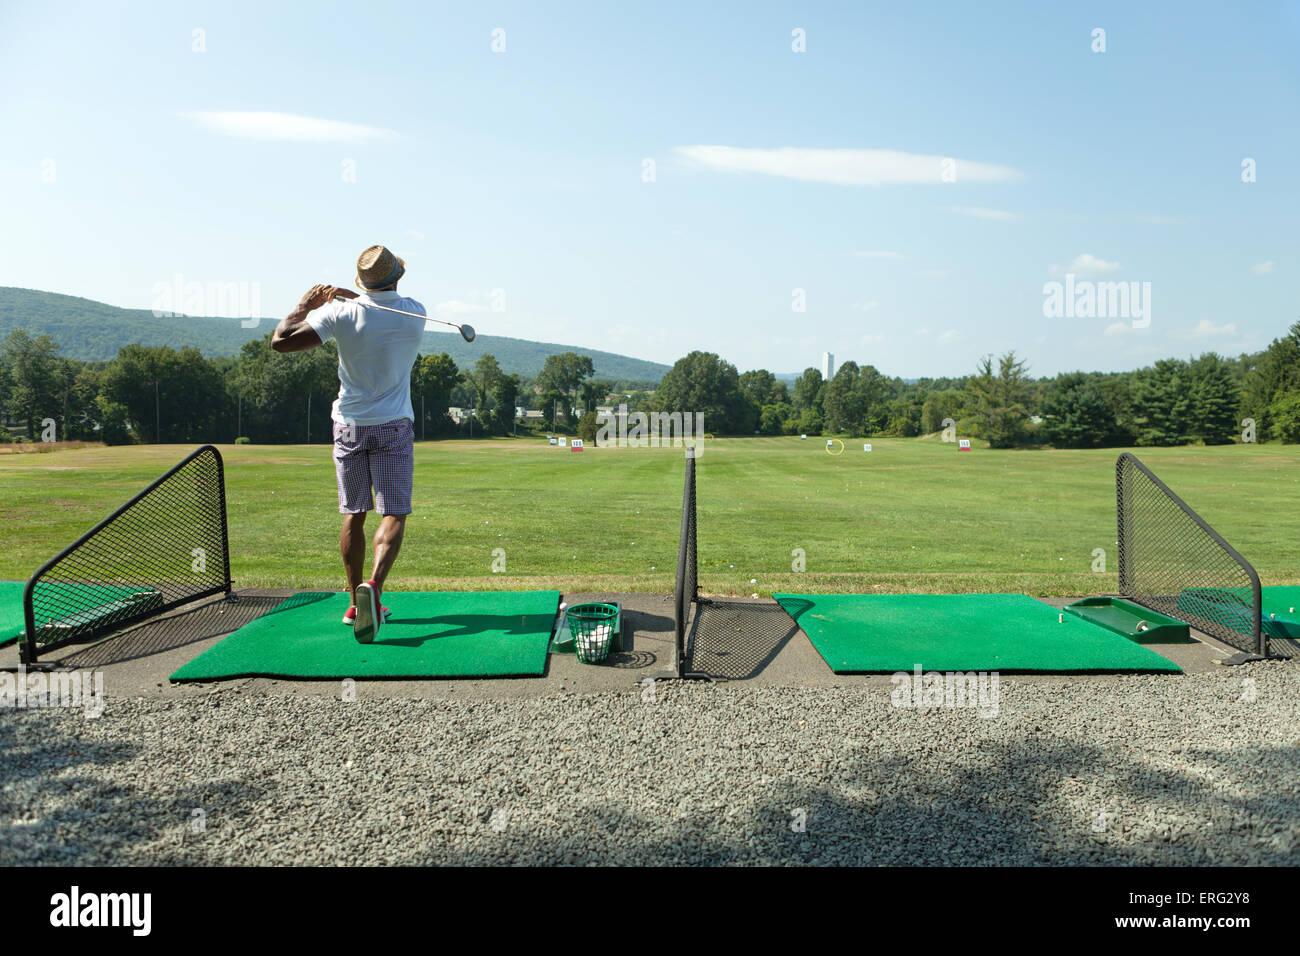 Golf at the Driving Range - Stock Image